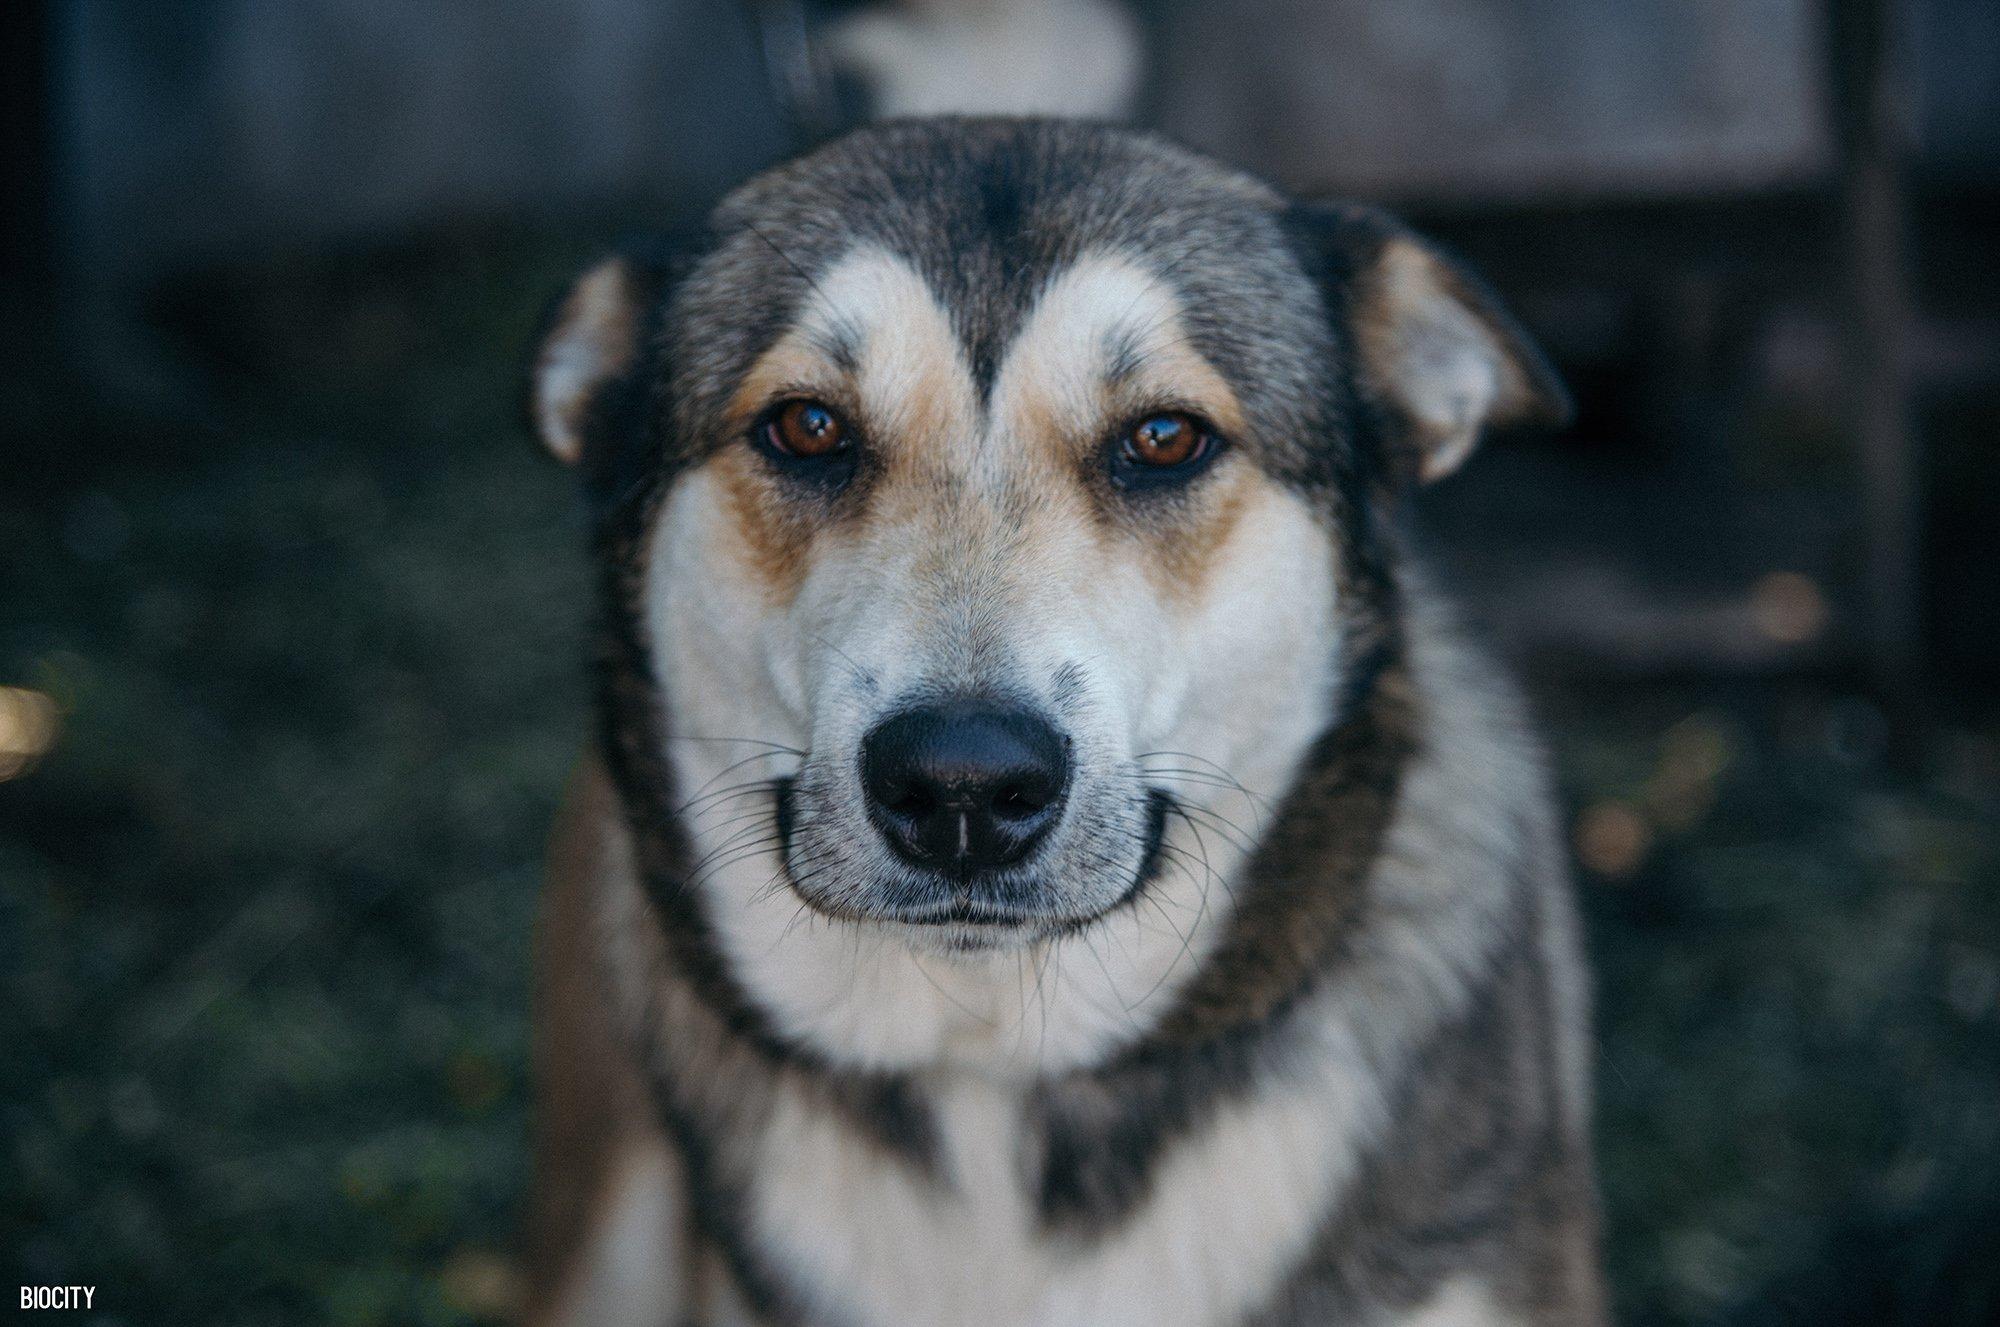 biocity, smile, dog, собака, пес, улыбака, улыбка,, Biocity